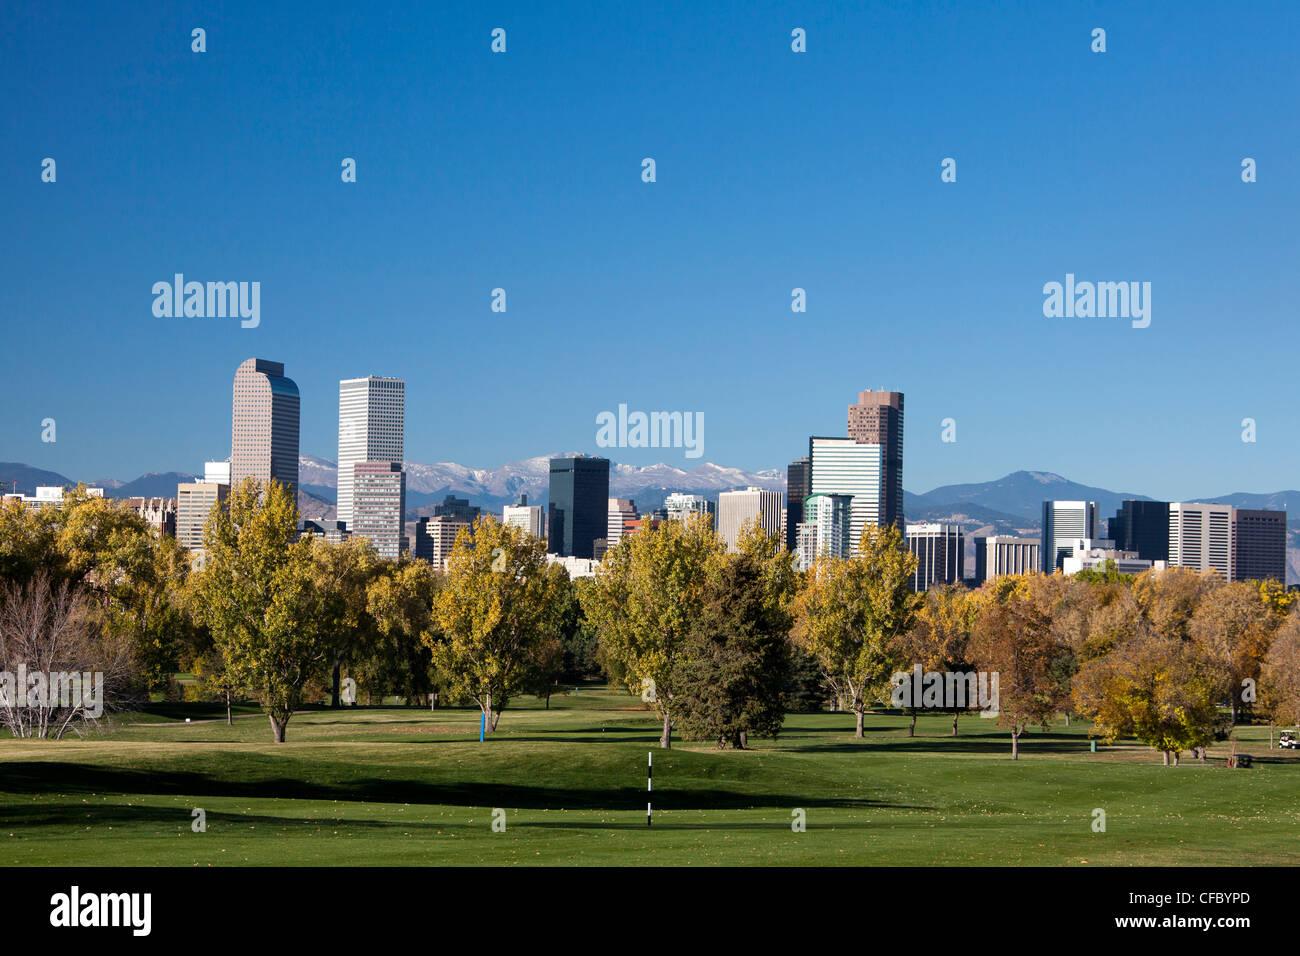 USA, United States, America, Colorado, Denver, City, Downtown, Skyline, Colorado Mountains, Autumn, architecture, - Stock Image